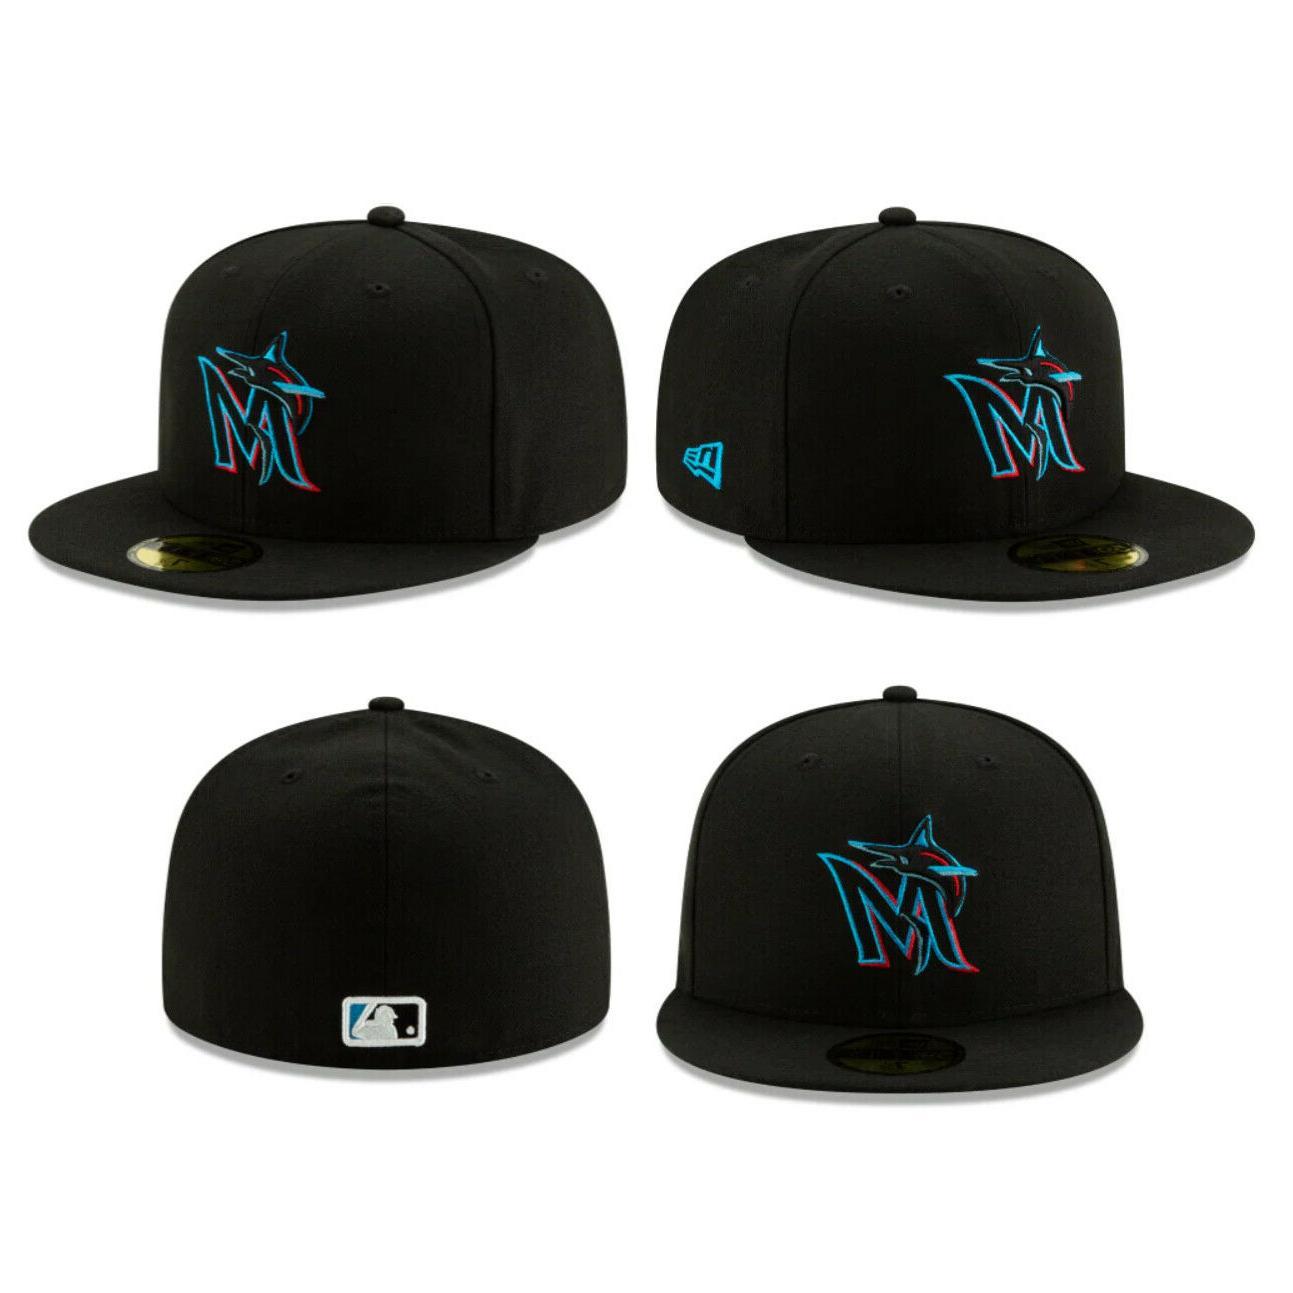 Miami Marlins MLB Authentic New Era 59FIFTY